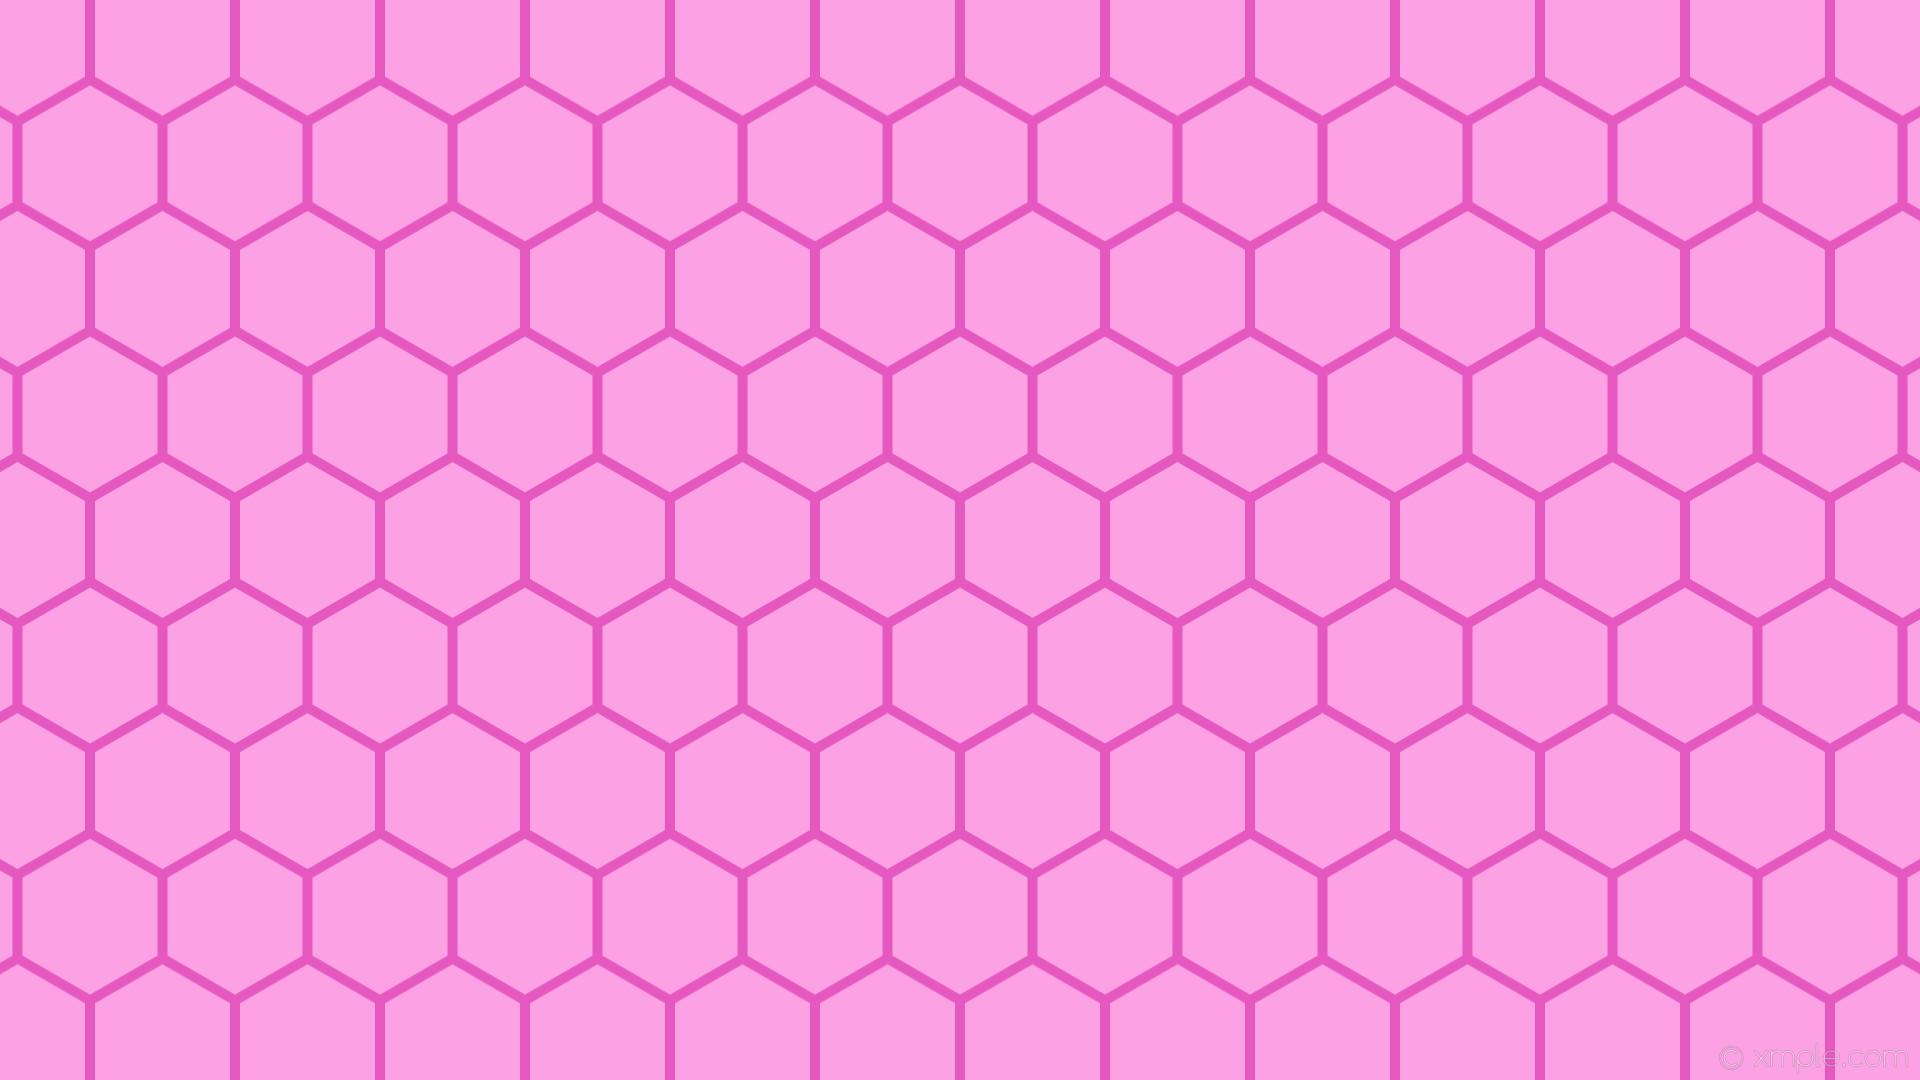 wallpaper beehive honeycomb pink hexagon light pink #fda1e5 #e558c0 0° 10px  145px